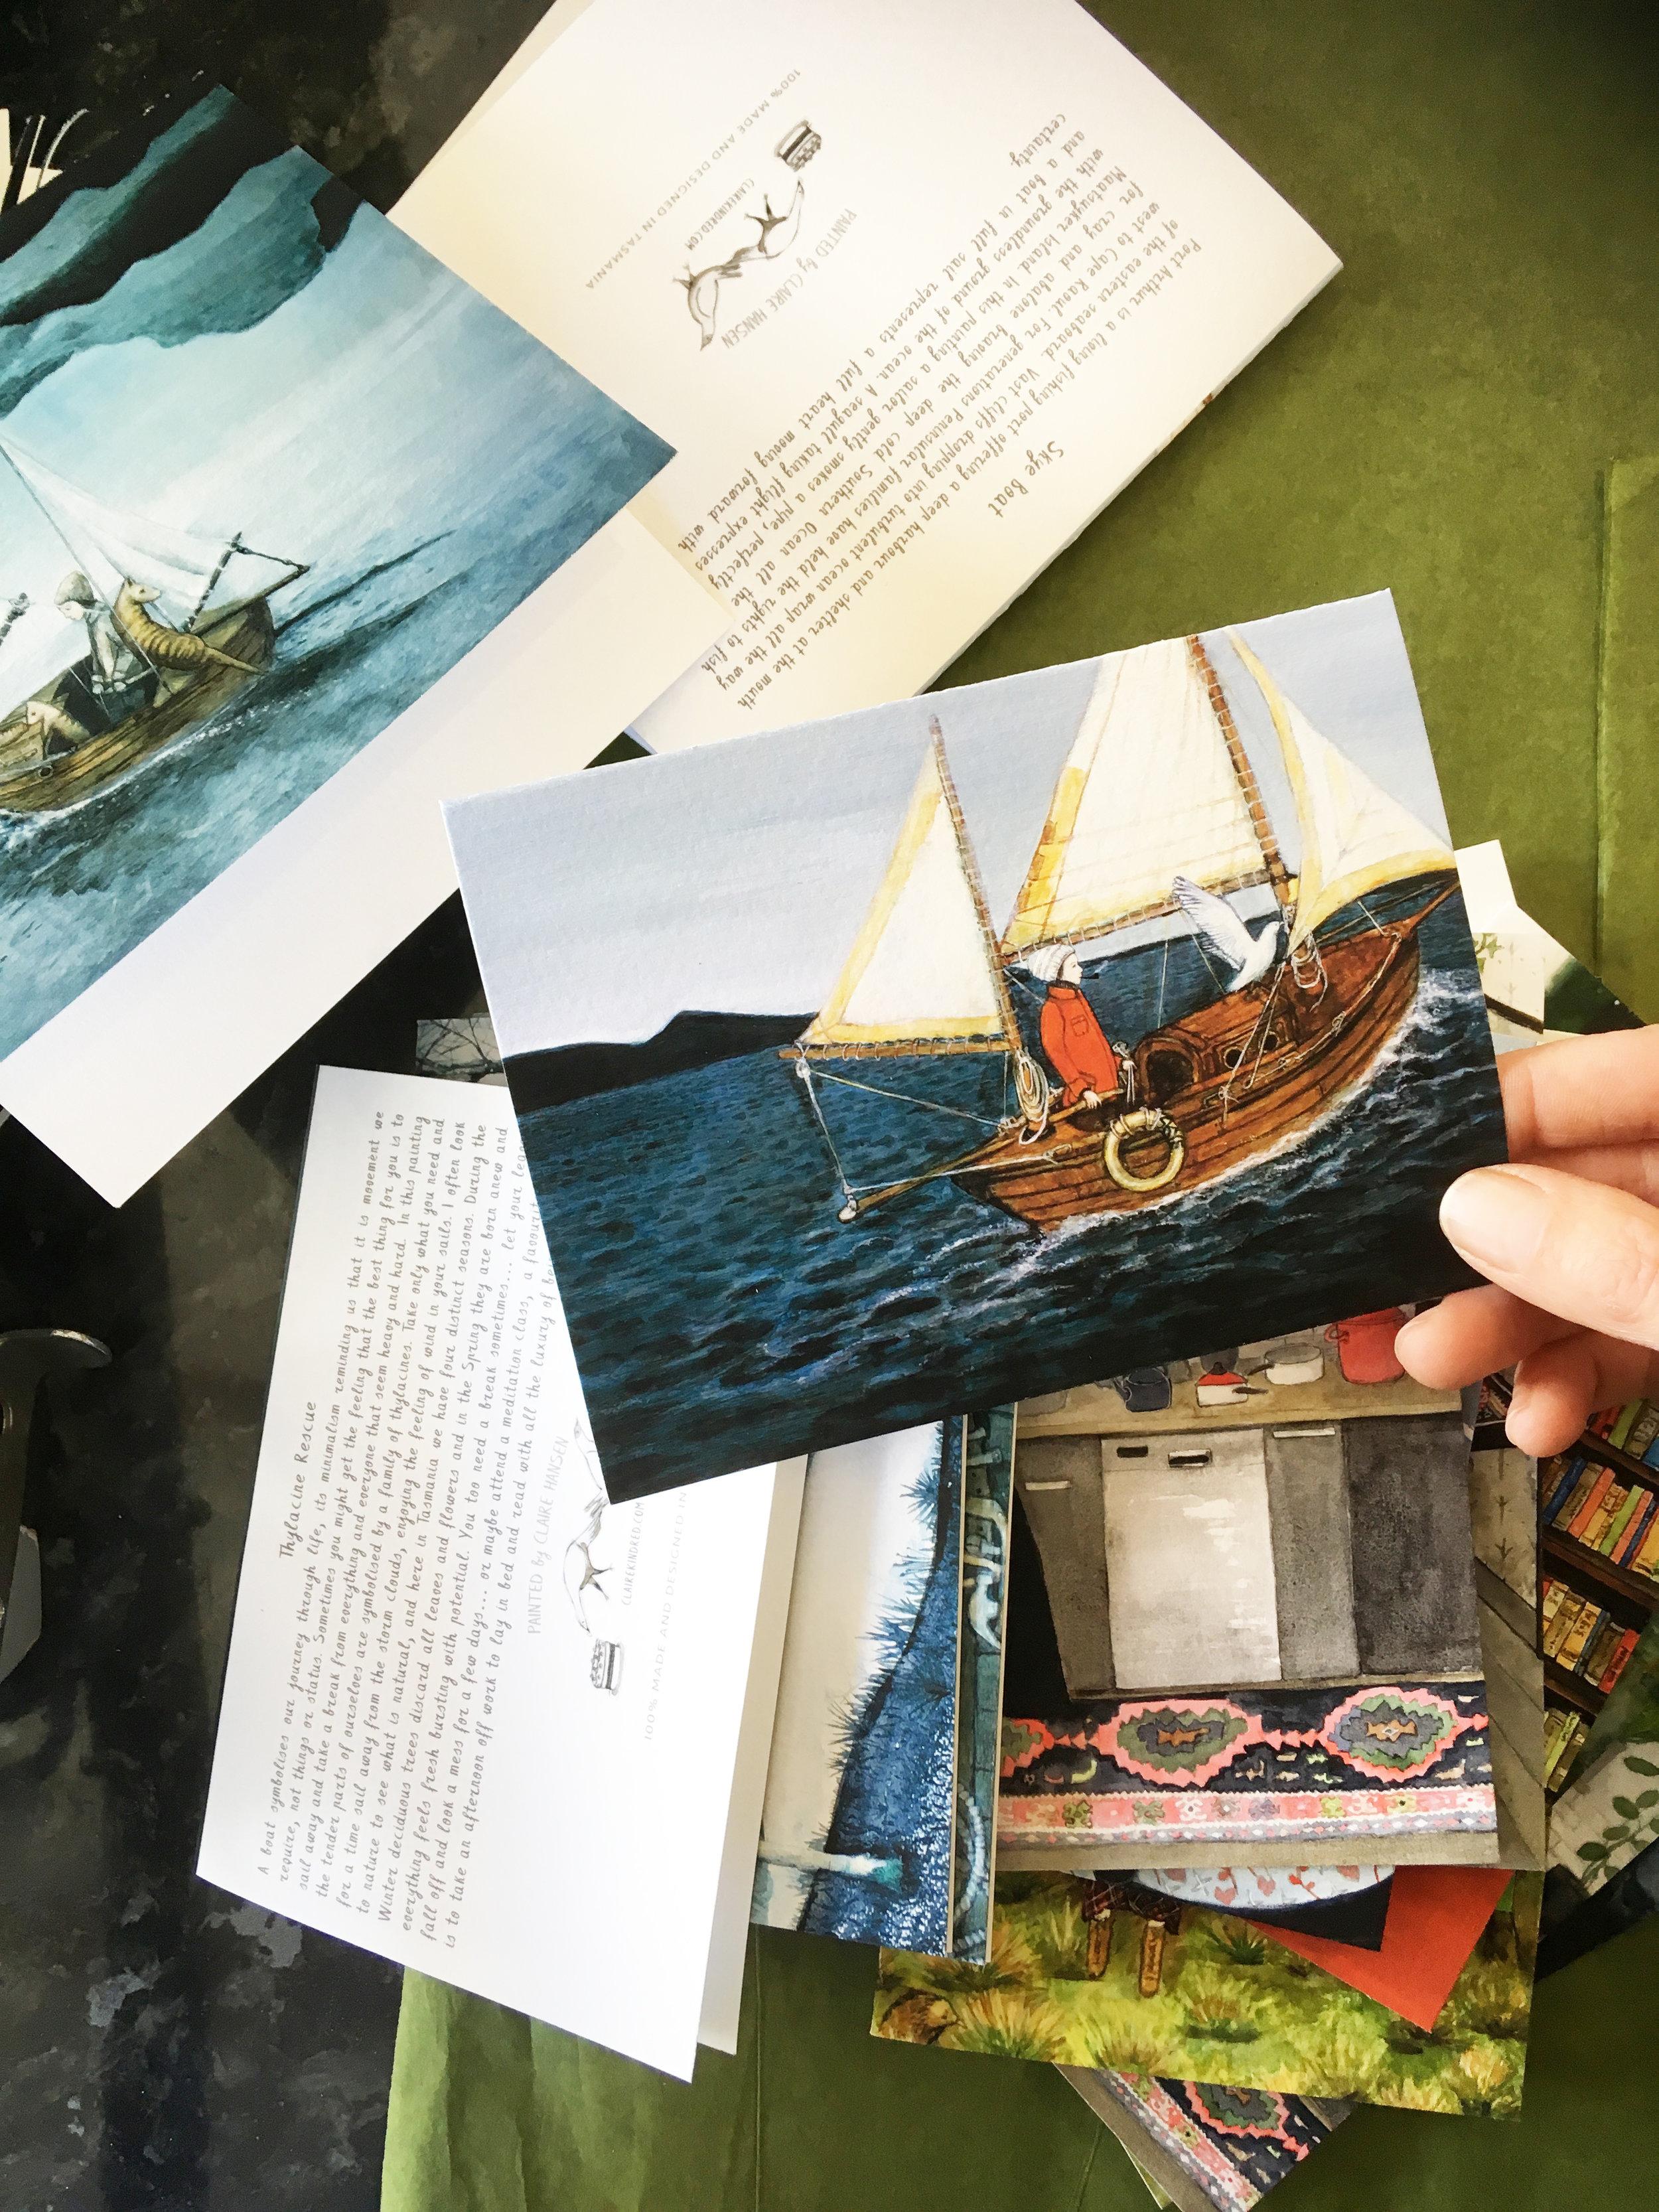 Claire_Hansen_Greeting Cards_Handmade on cottonrag.jpg